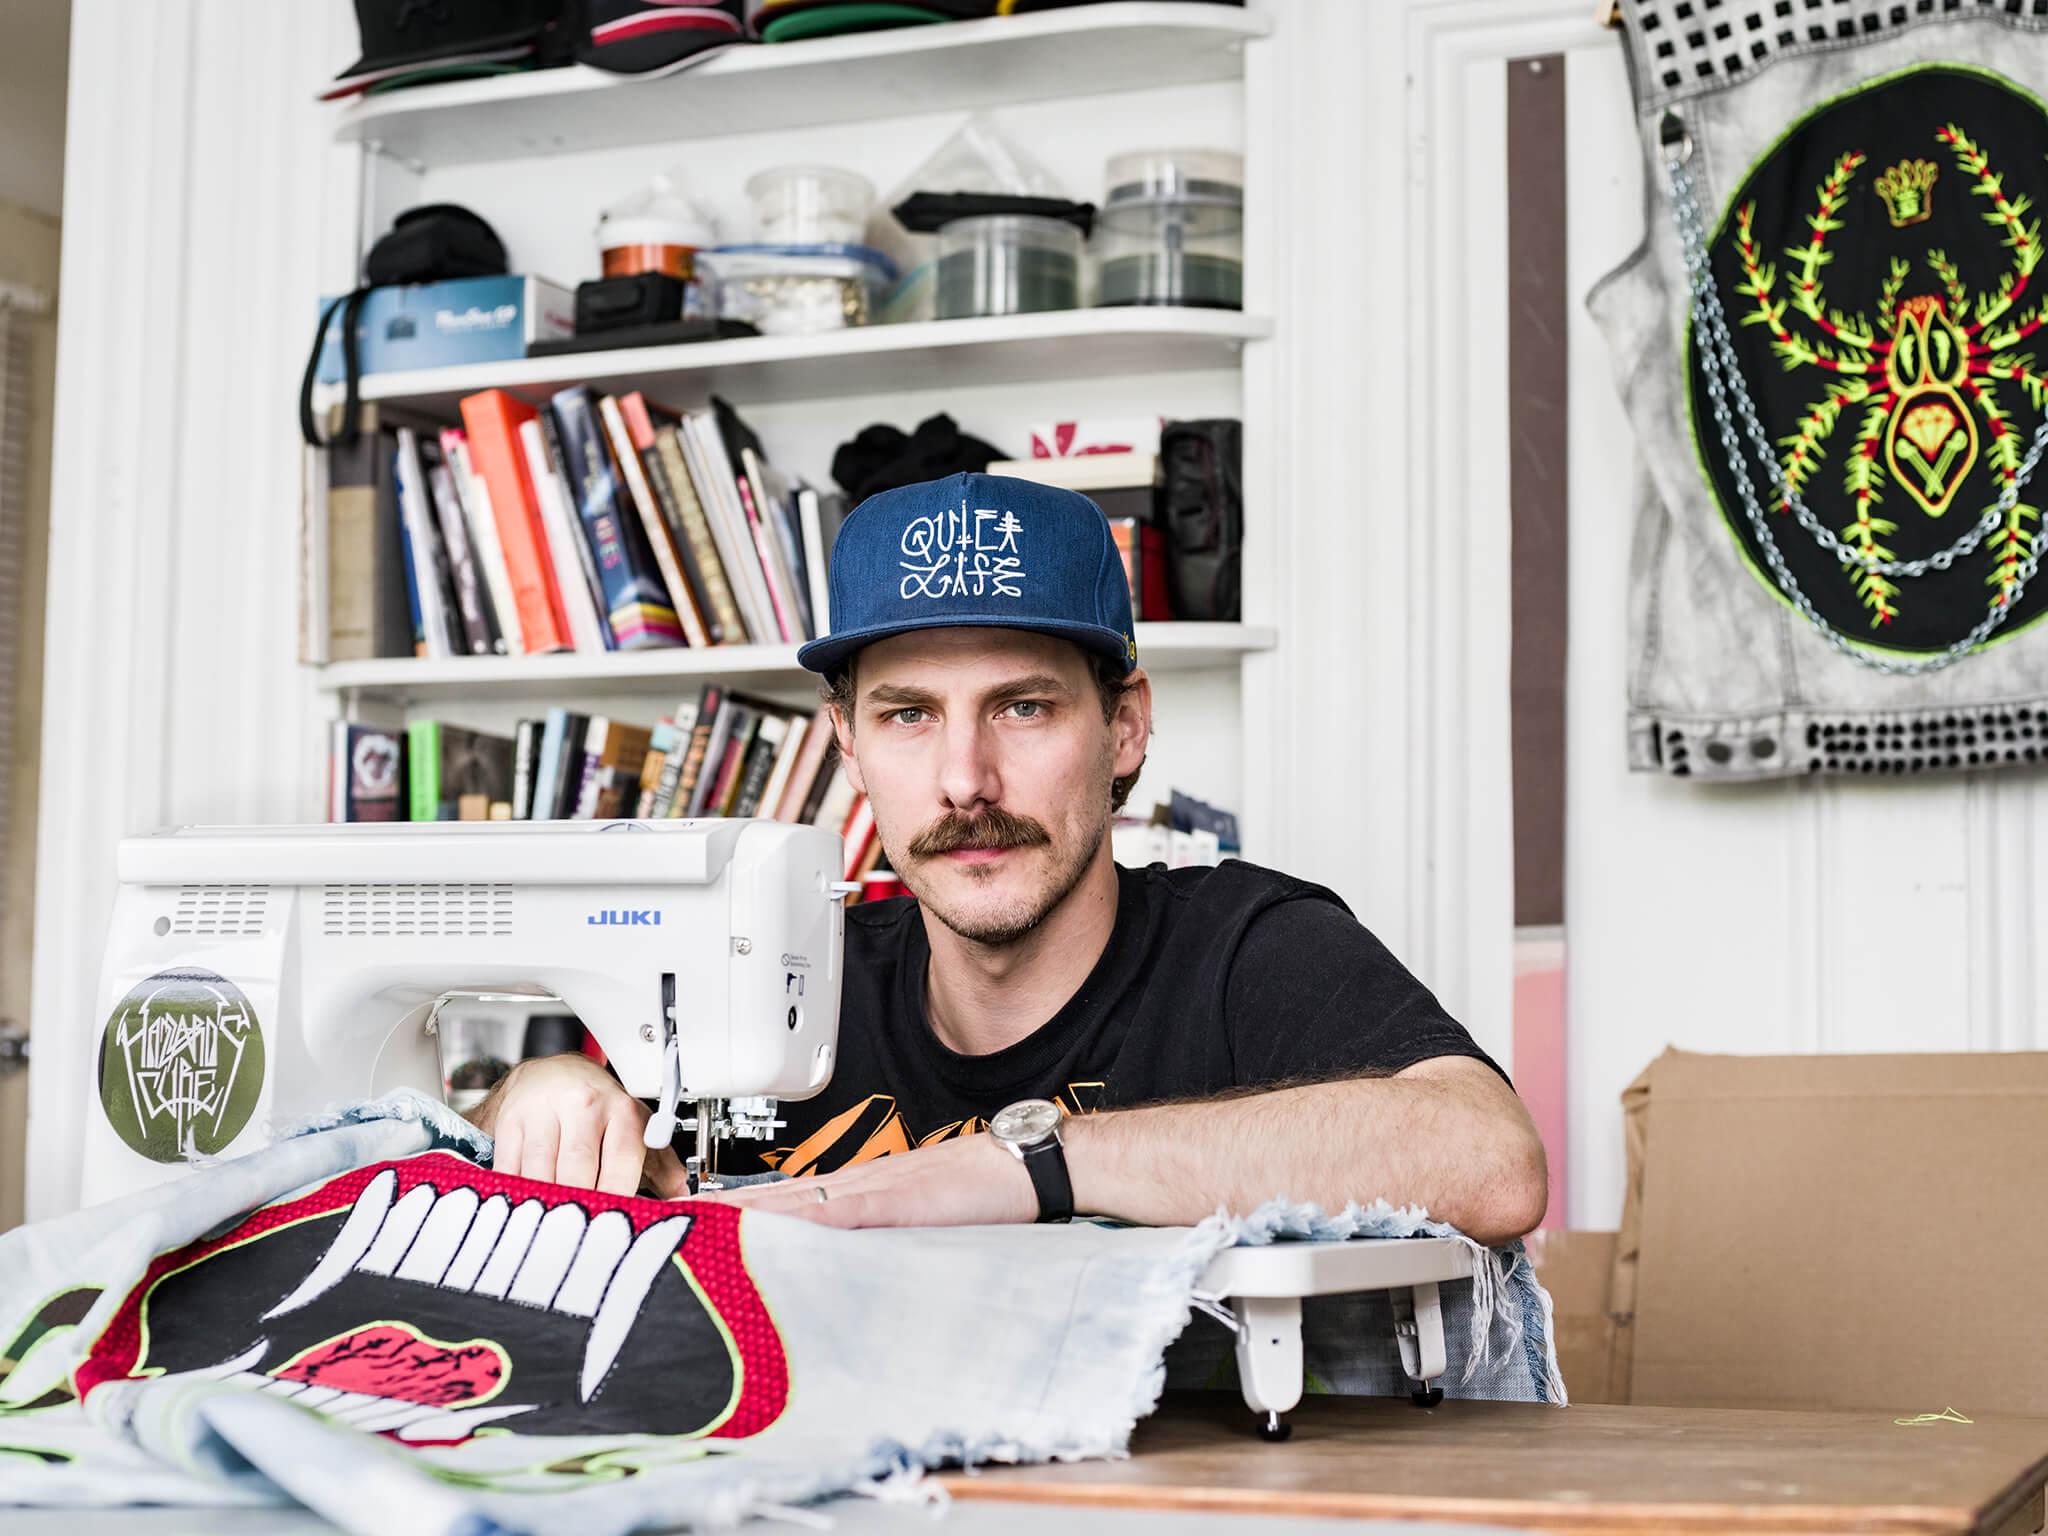 Ben Venom in his studio with sewing machine